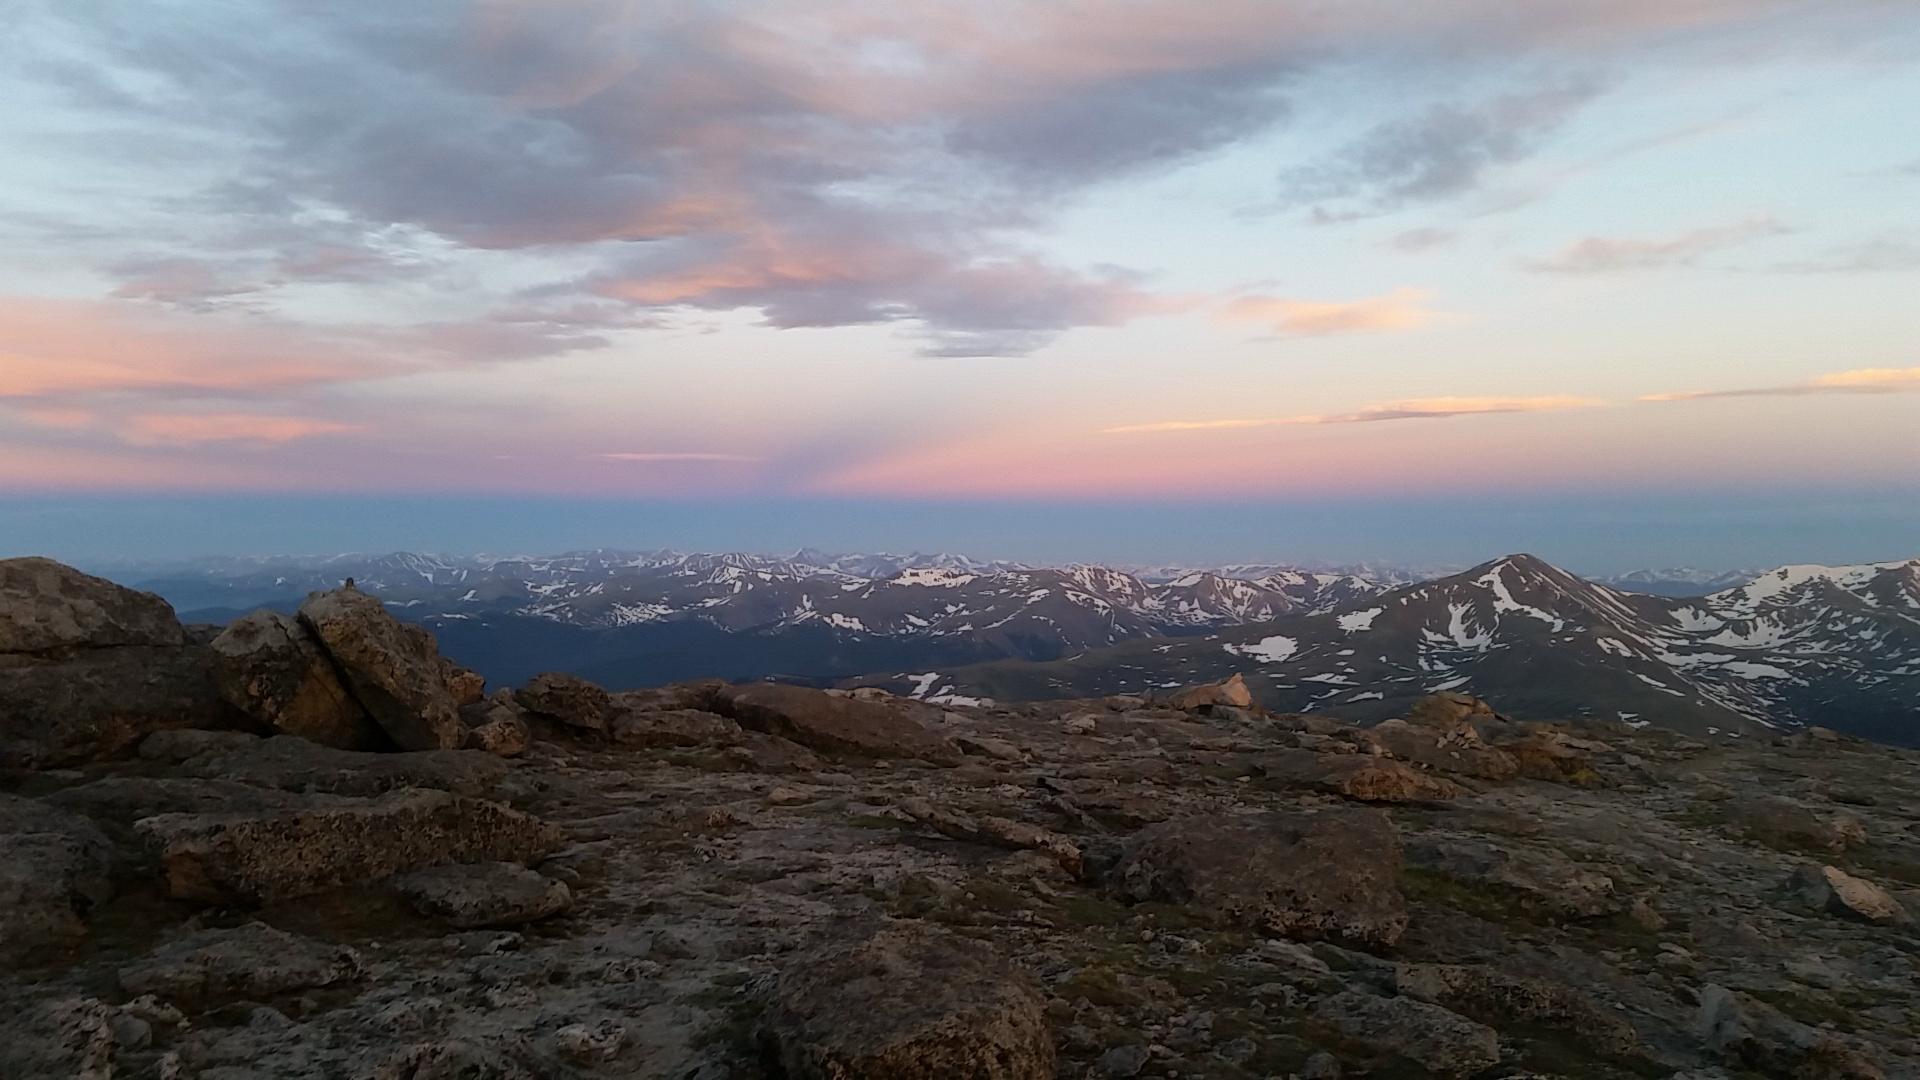 Cotton-Candy-Sunrise-Mt-Spalding-Colorado-Rockies-1080x1920-OC-wallpaper-wp3604370